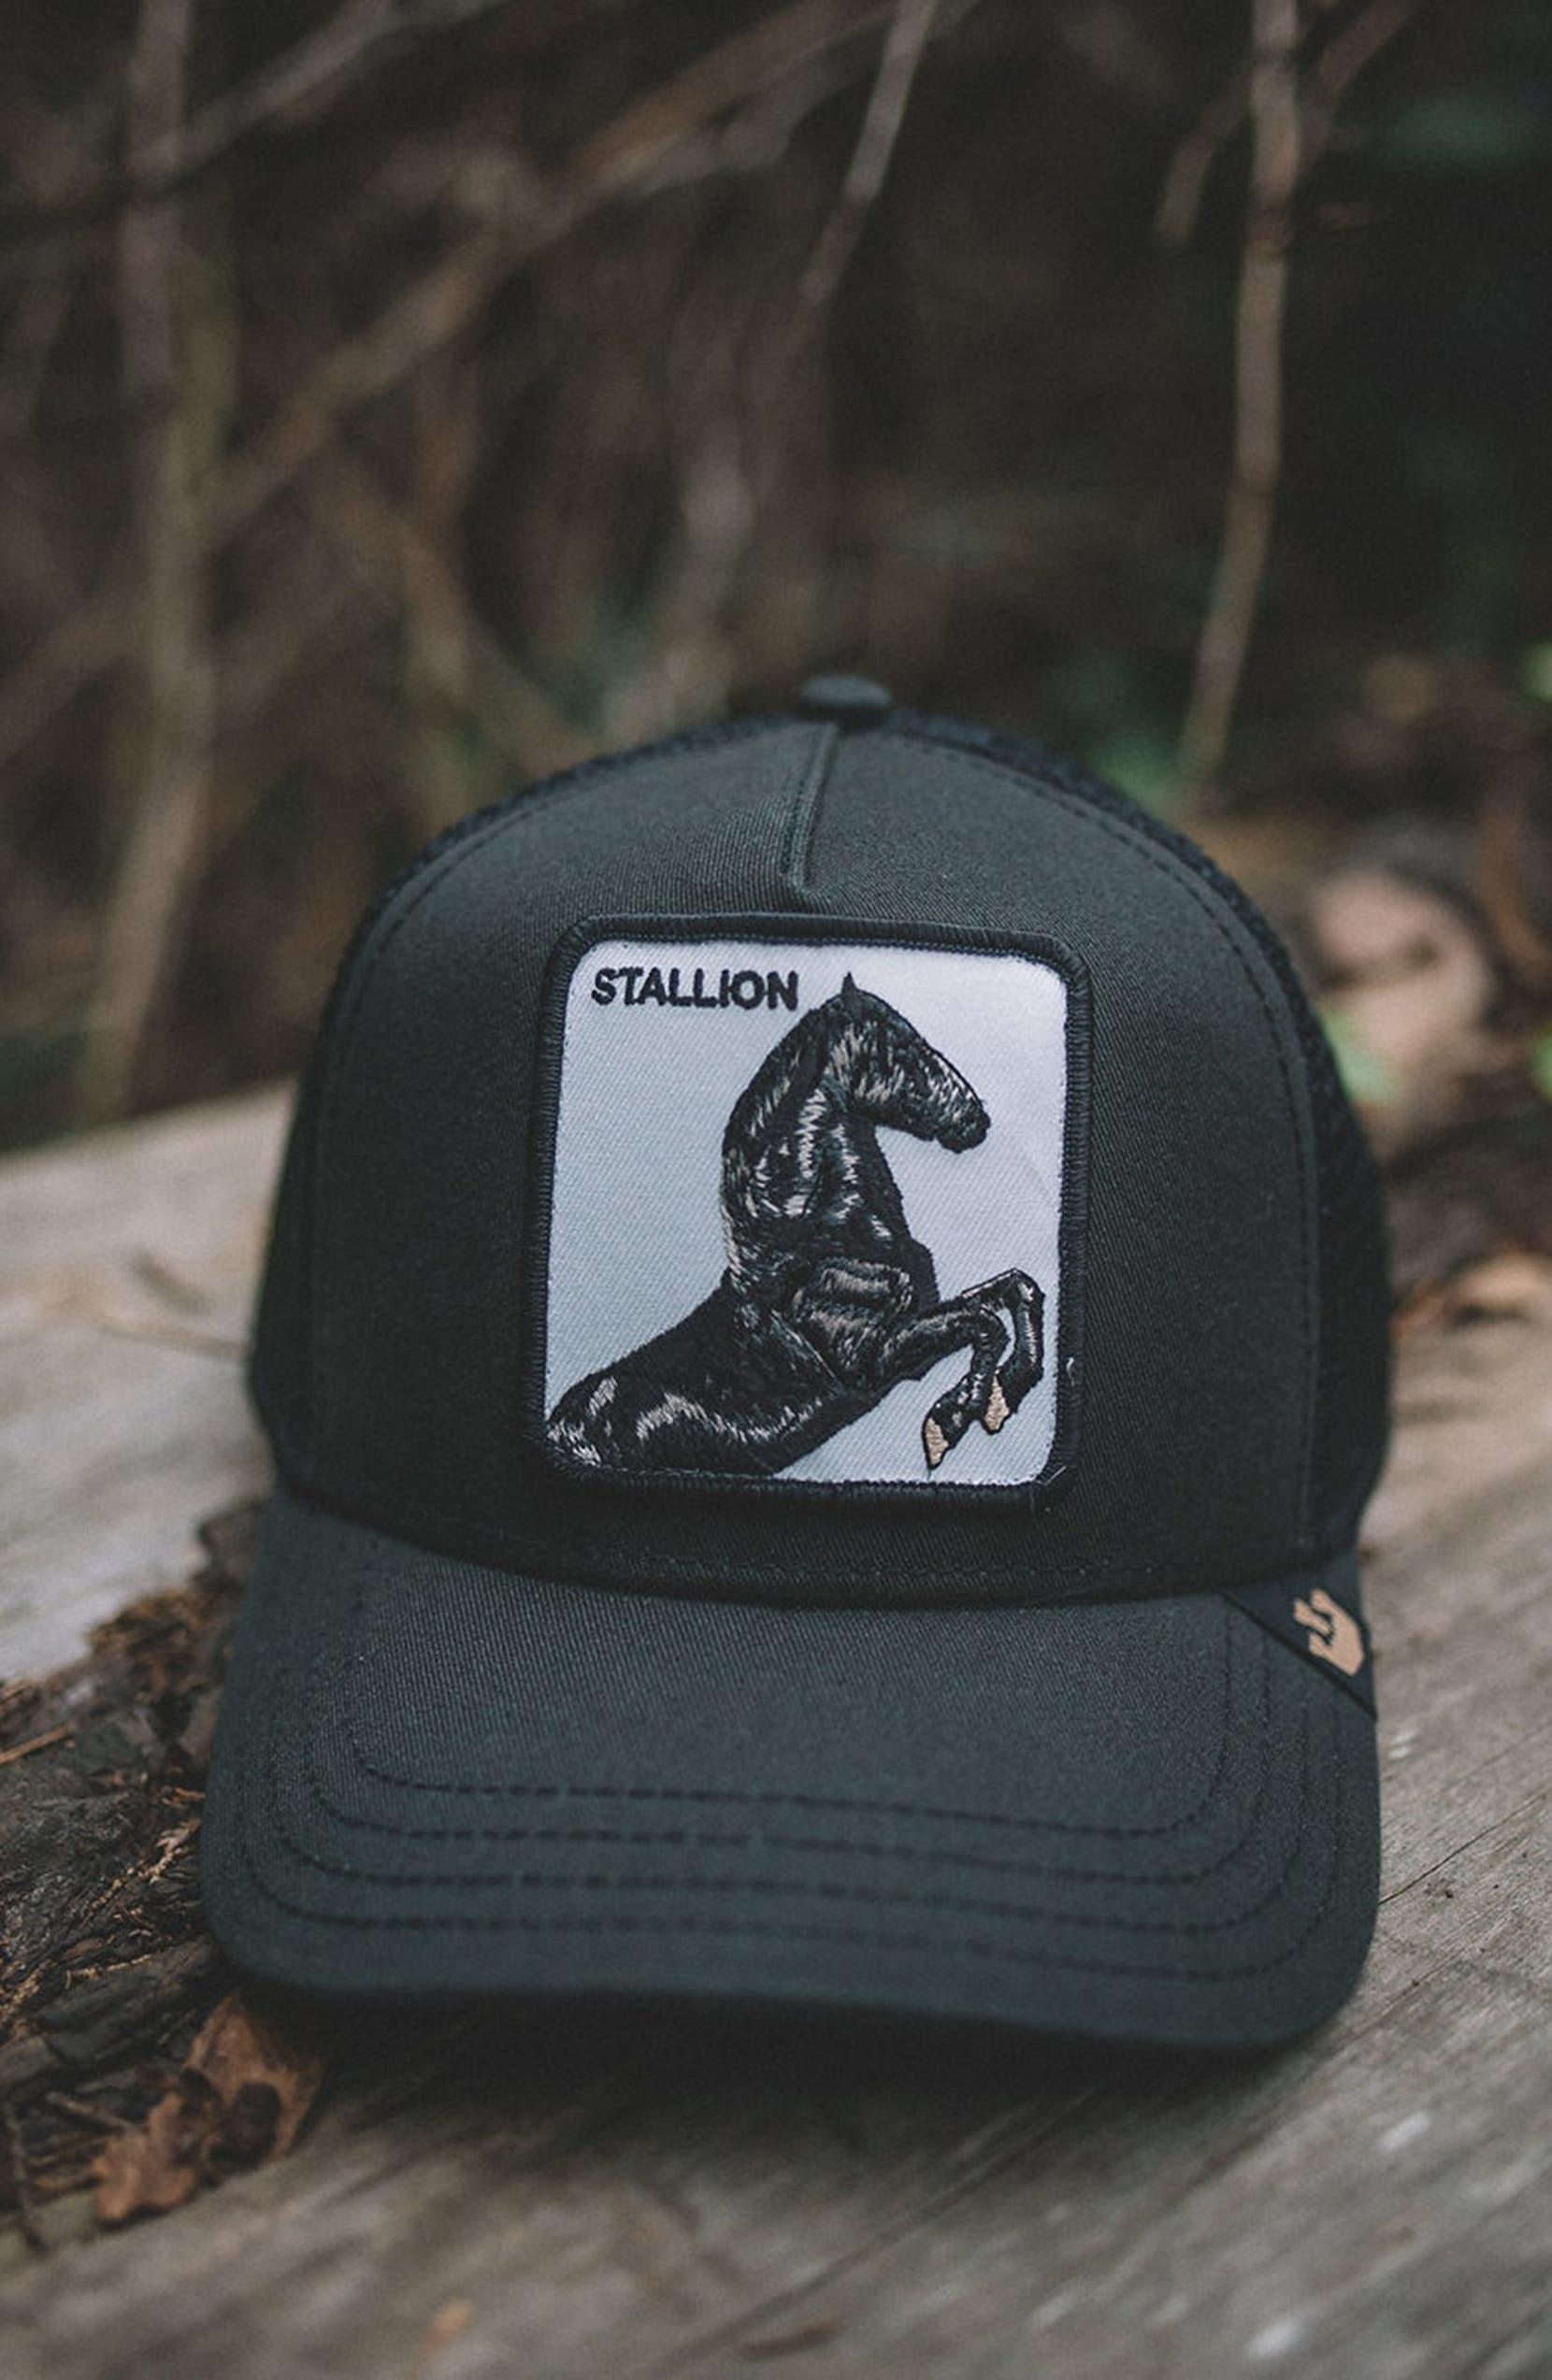 371b8d1dbb6b59 Goorin Bros. Stallion Trucker Hat | Nordstrom